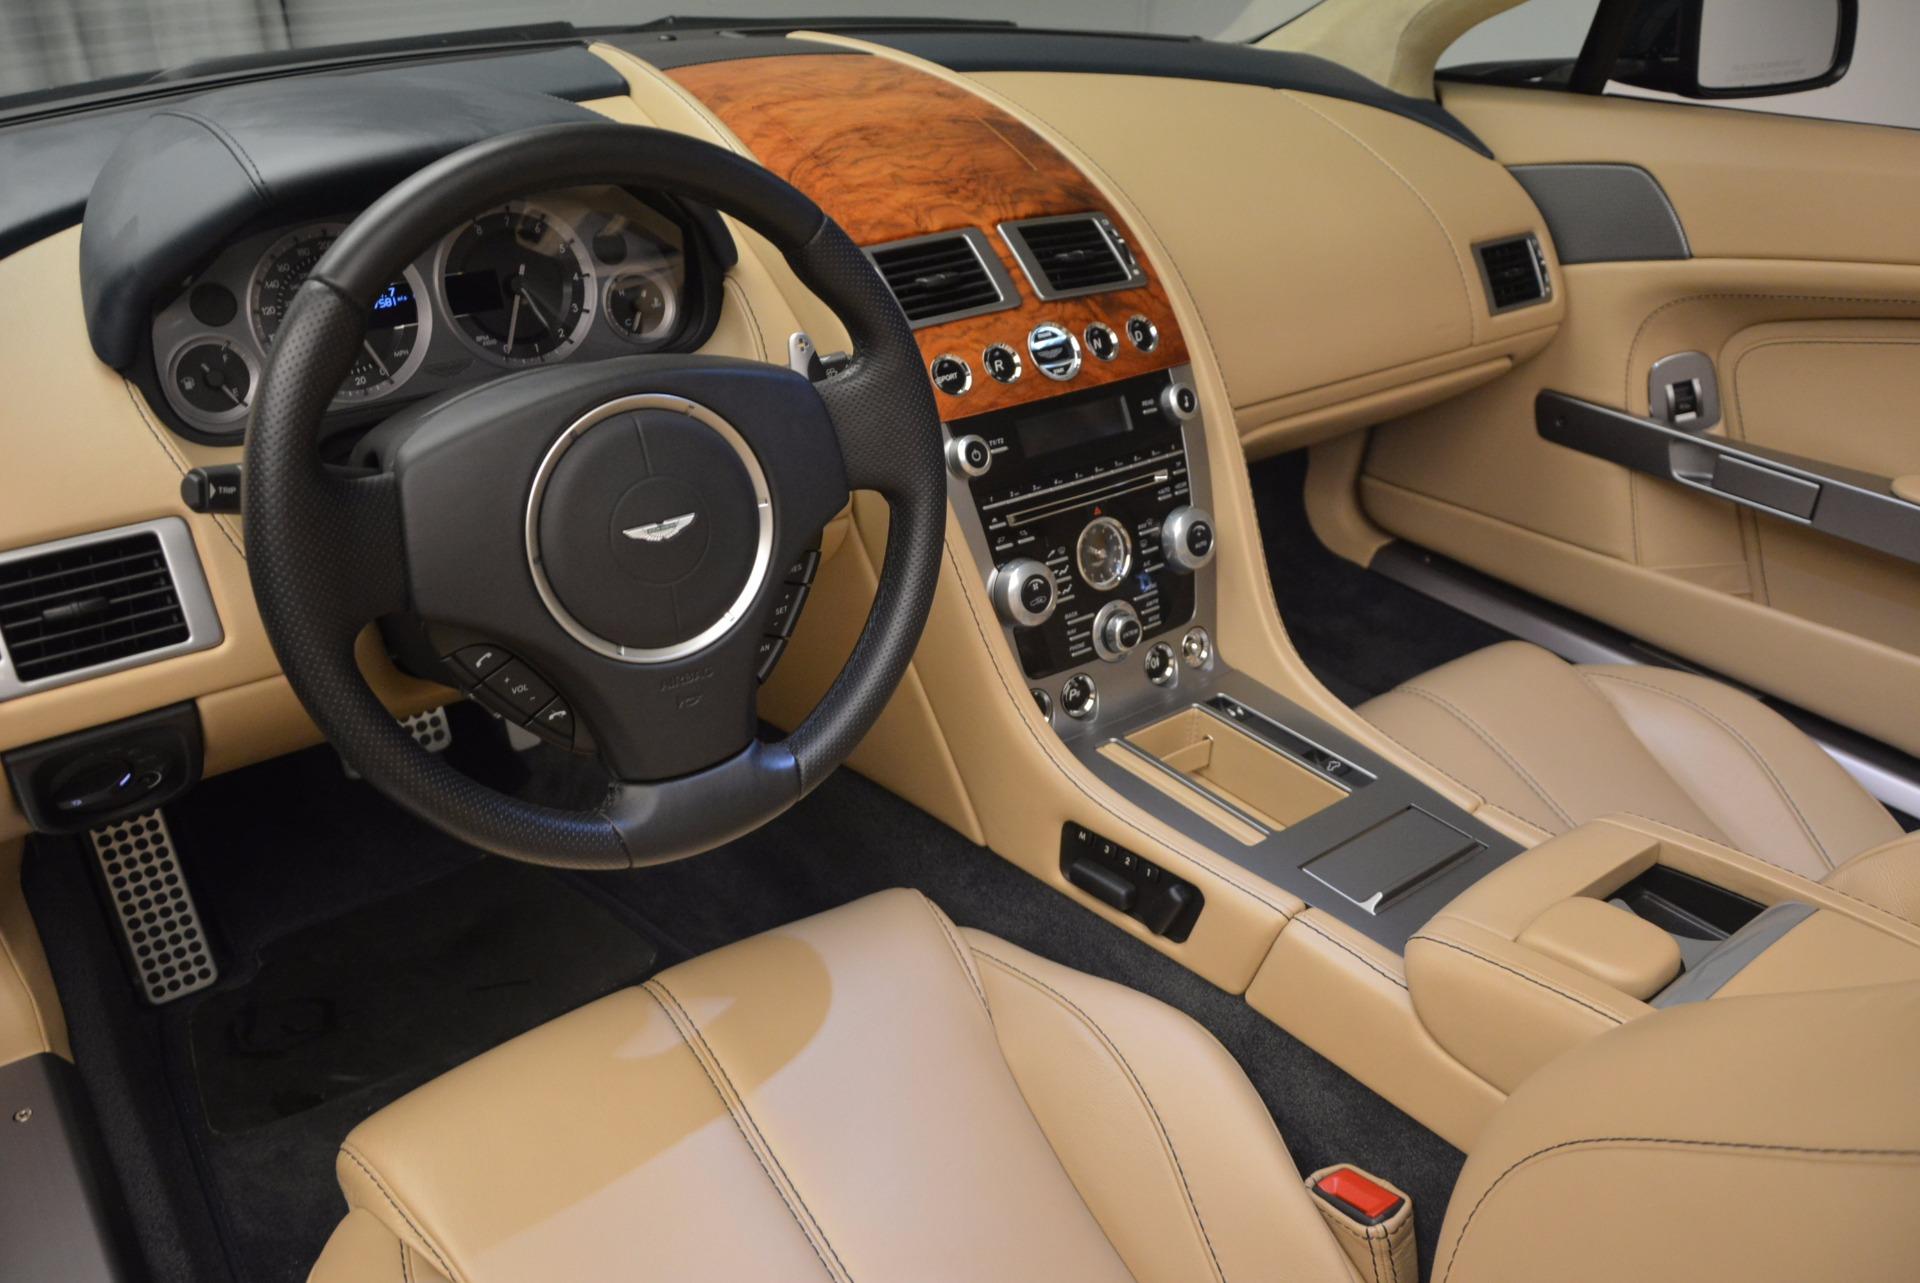 Used 2014 Aston Martin V8 Vantage Roadster For Sale In Westport, CT 1623_p21